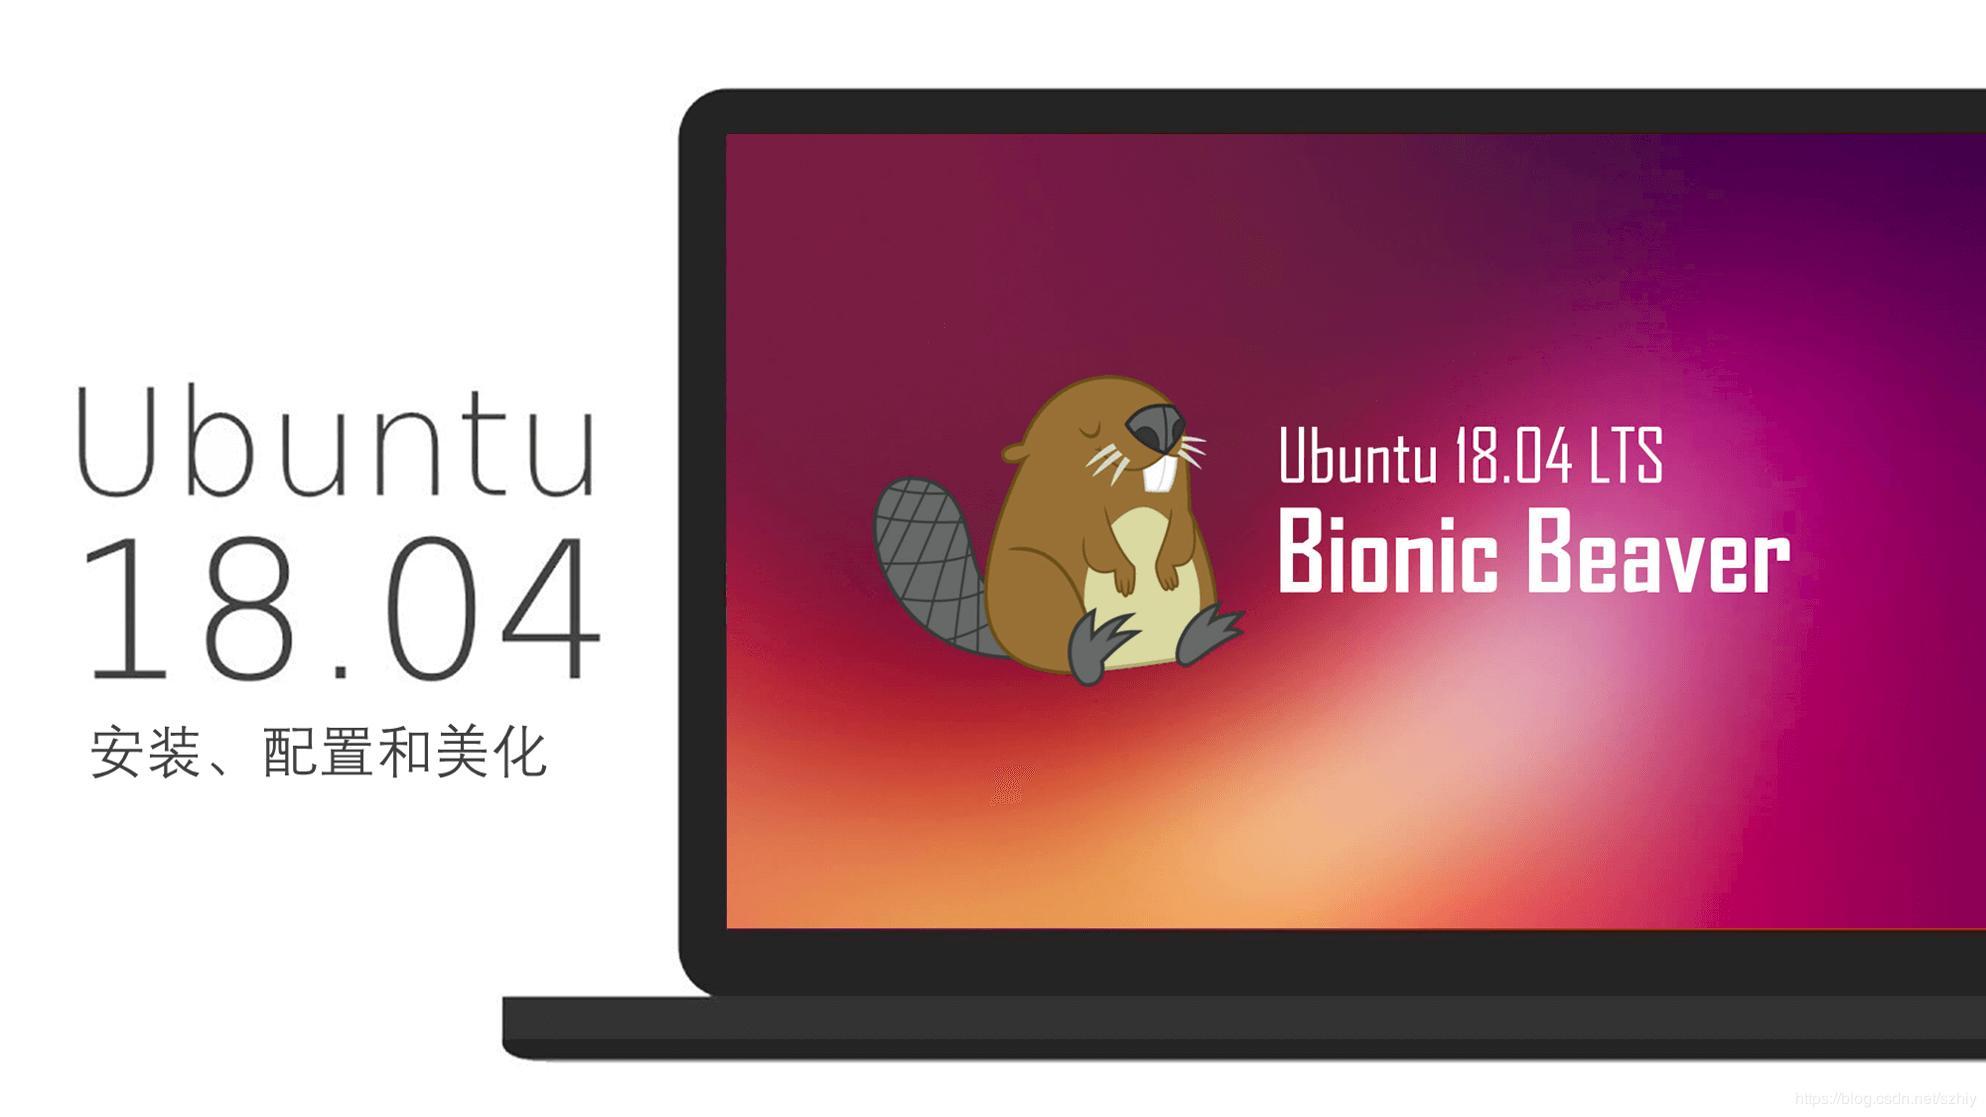 Ubuntu 18 04 installation record - Programmer Sought